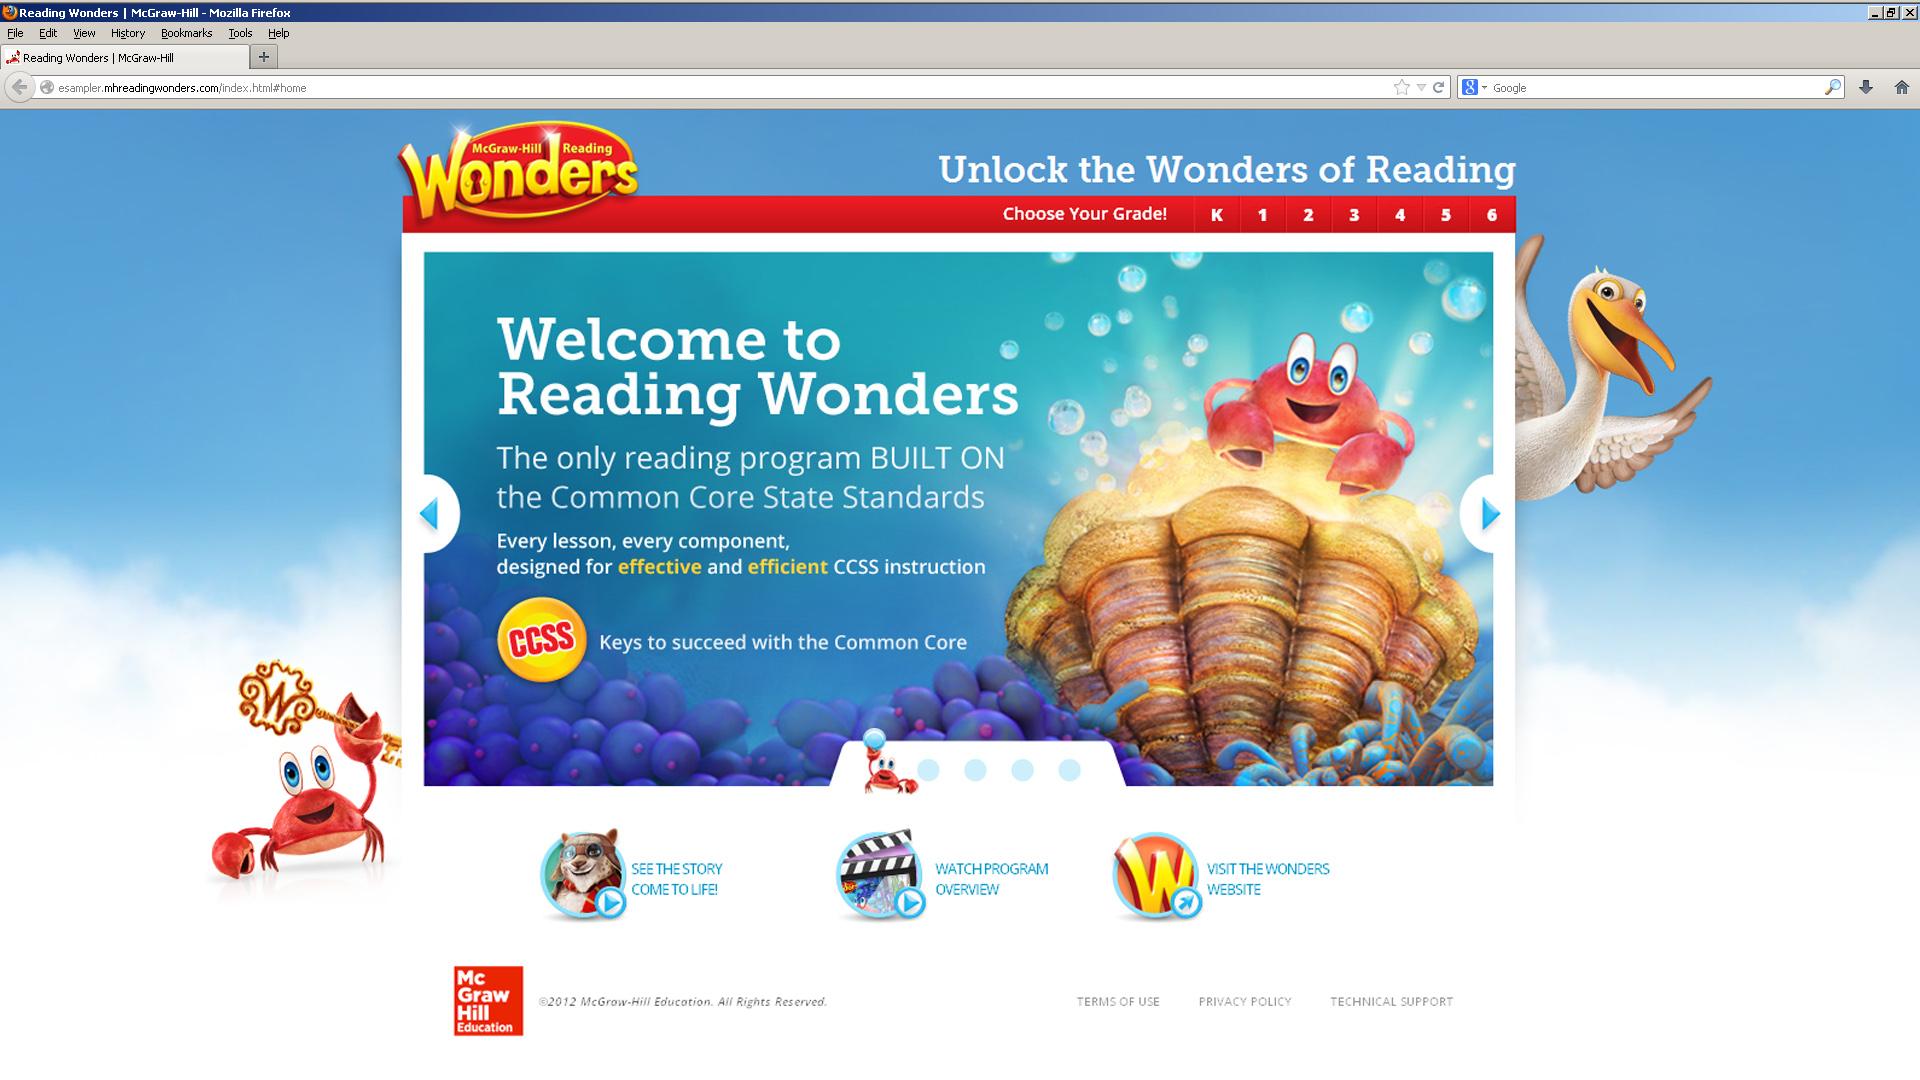 Mcgraw Hill Education Wonders Esampler Website